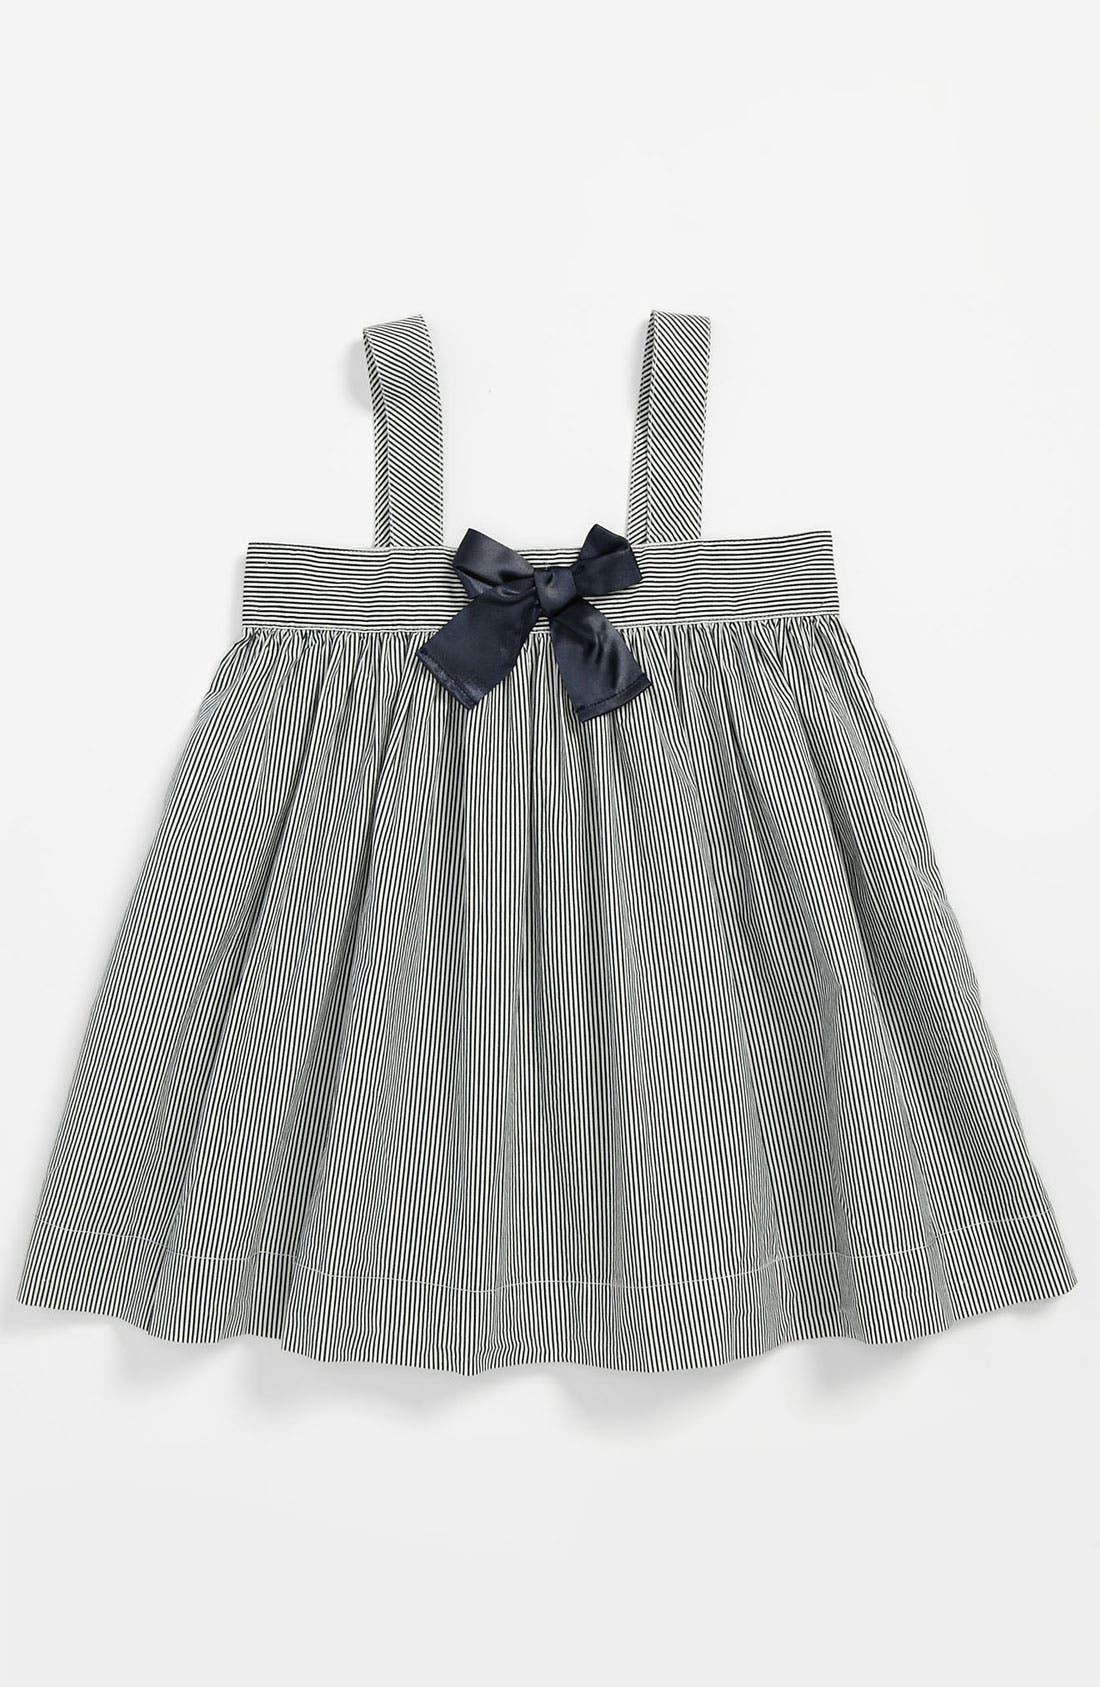 Alternate Image 1 Selected - United Colors of Benetton Kids Stripe Dress (Toddler)